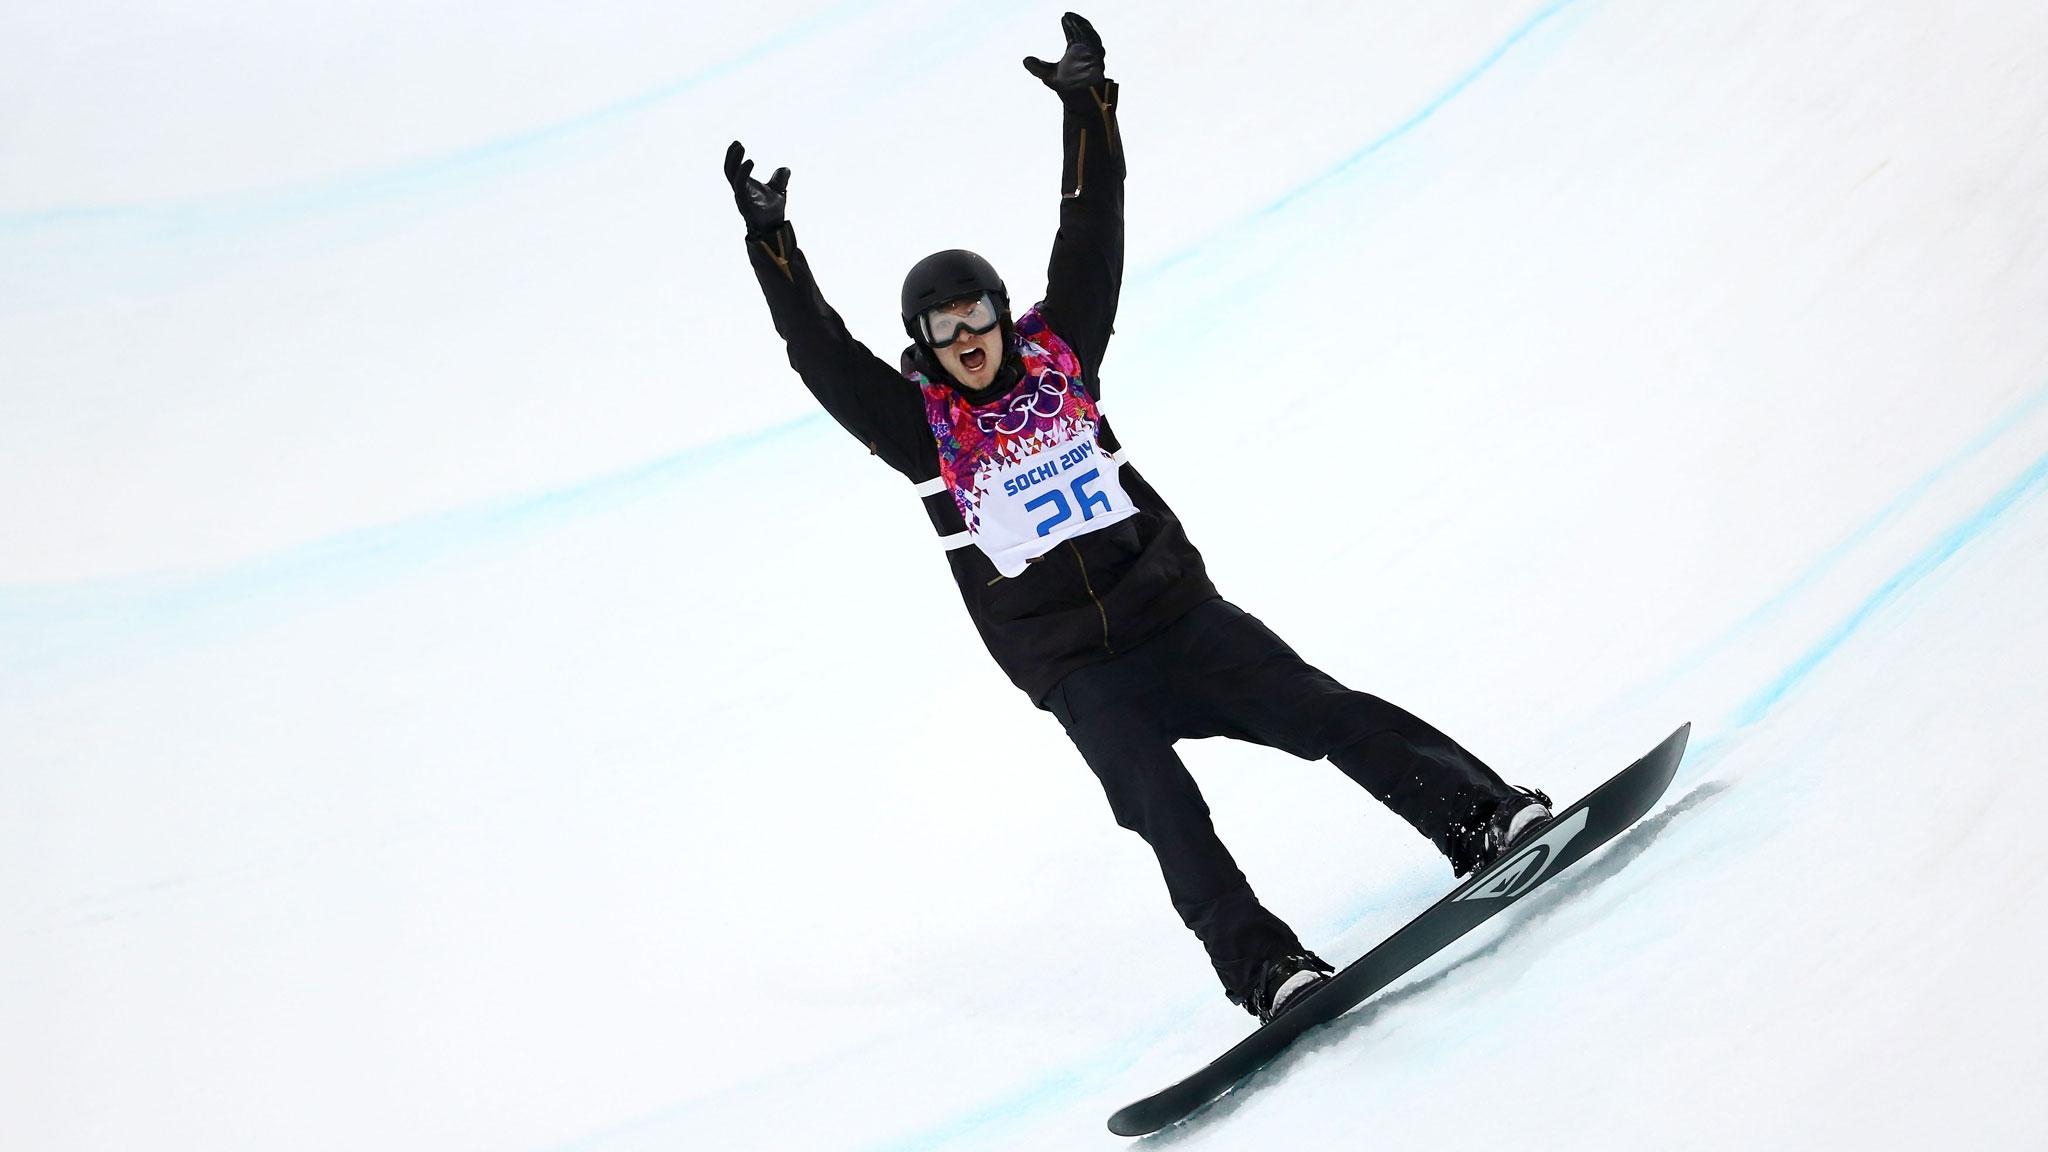 Сноуборд хафпайп олимпиада 18 фотография